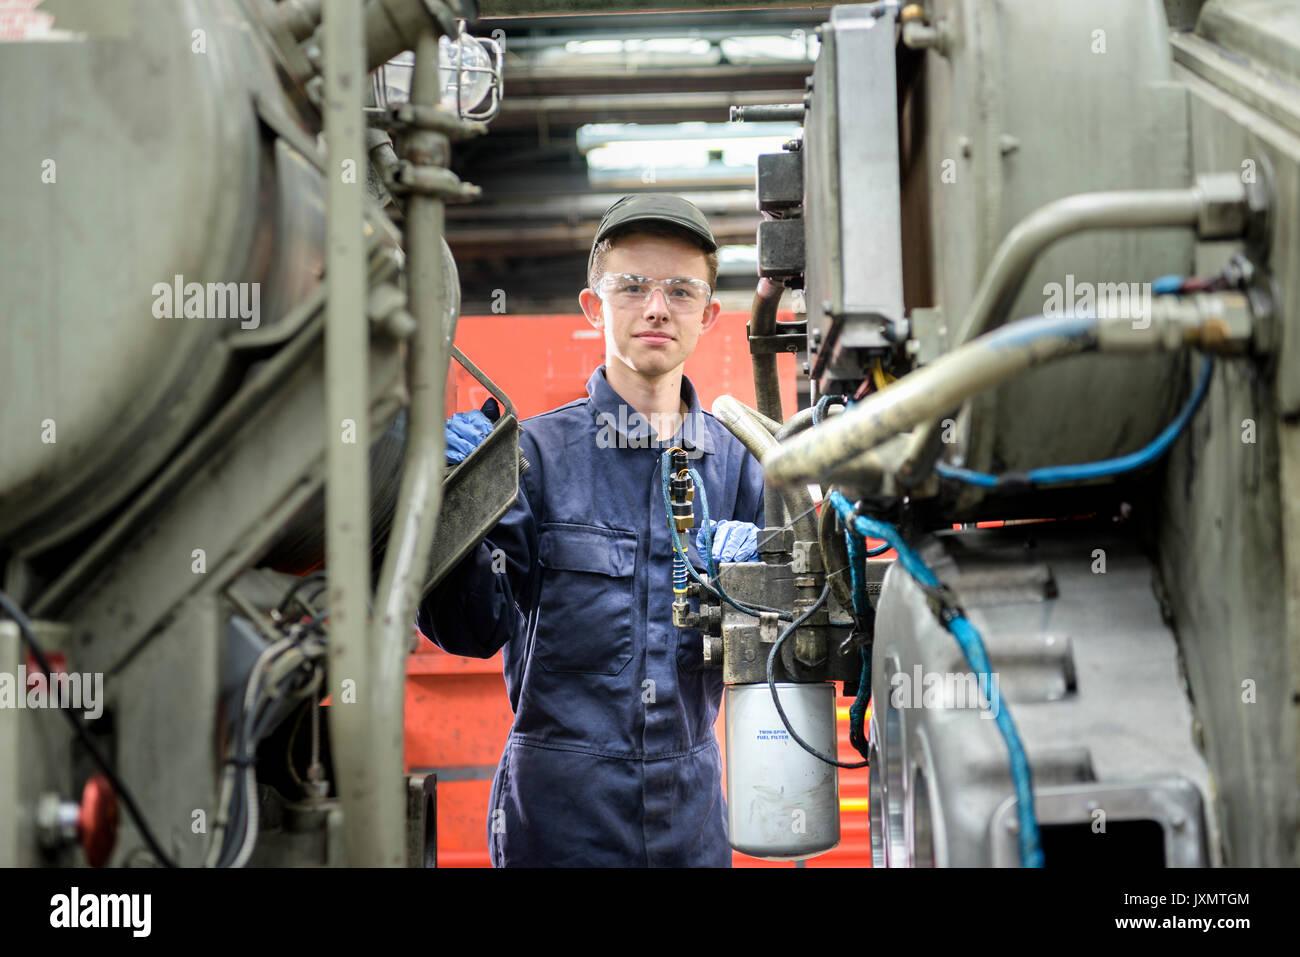 Porträt der jungen Lehrling Lokführer in Zug arbeitet Stockbild